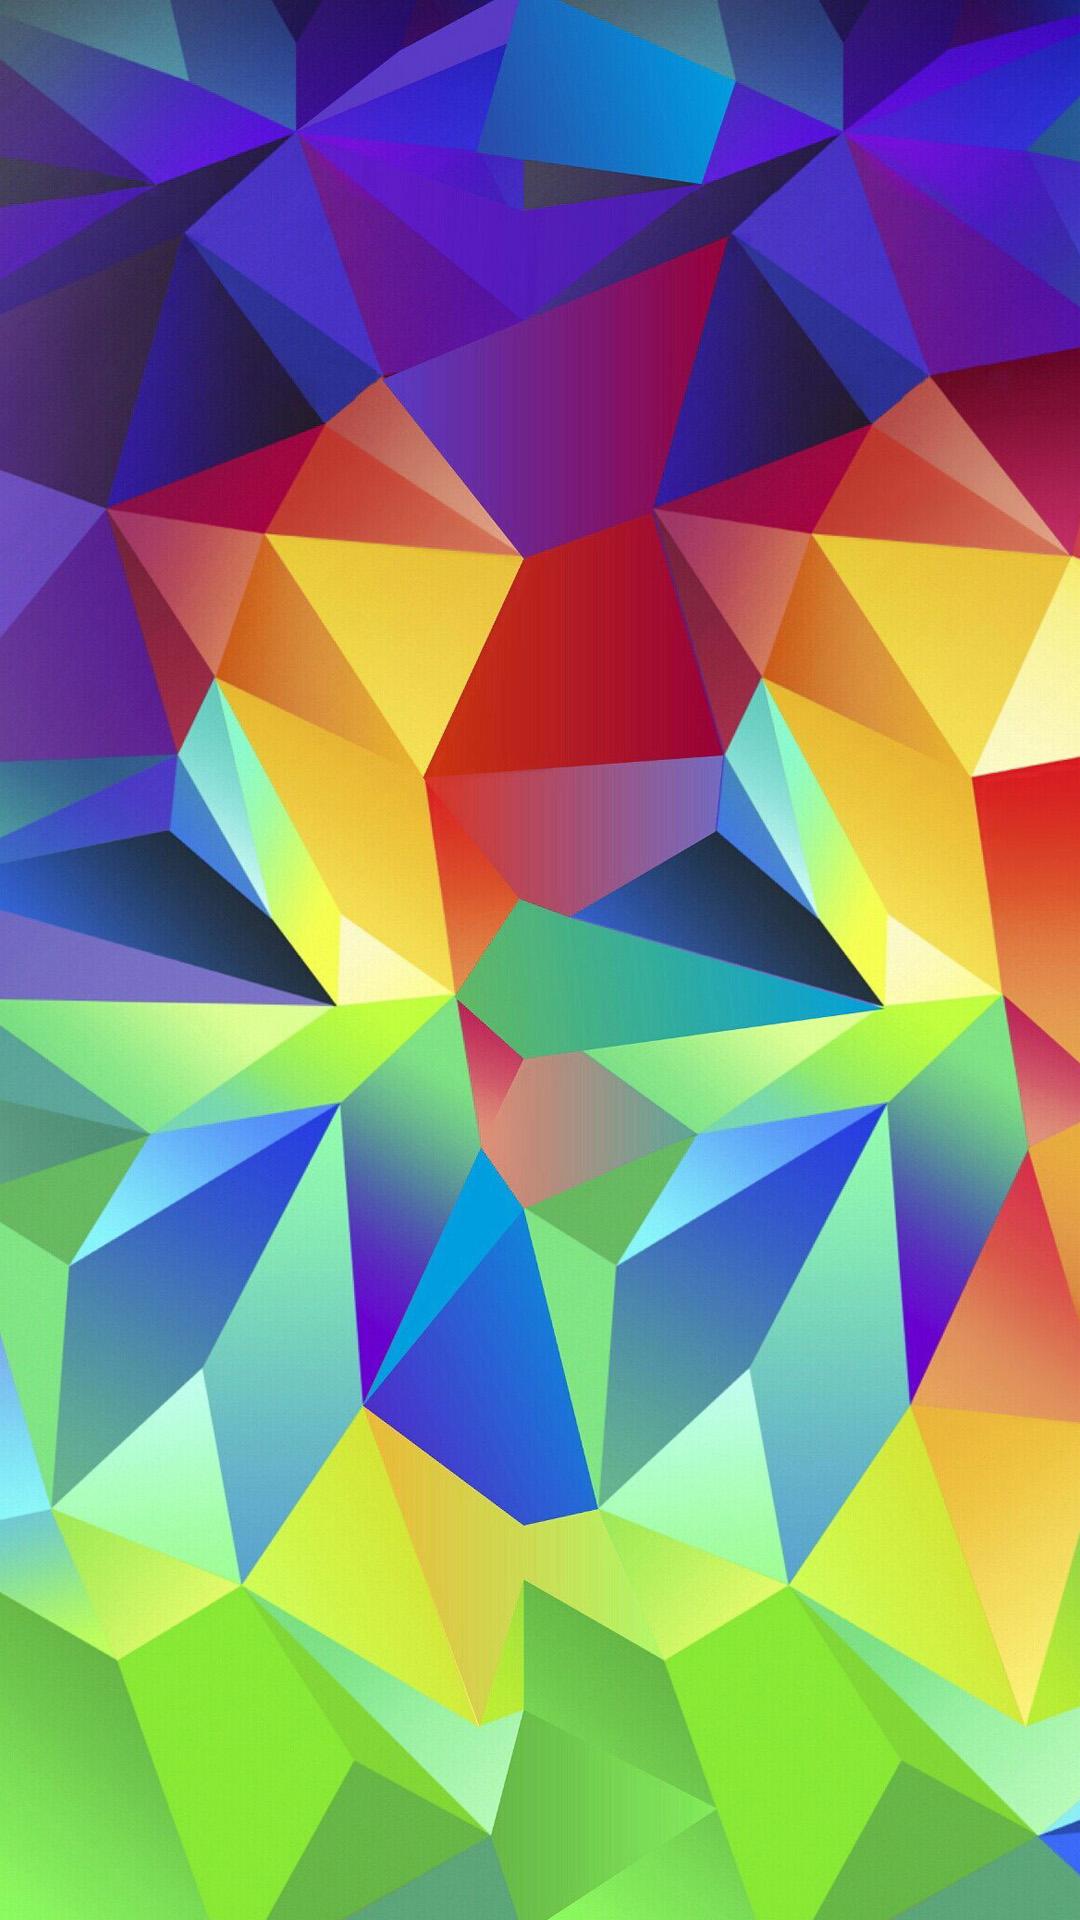 Official Galaxy S5 Wallpaper 02 Samsung Galaxy S5 Wallpapers HD 1080x1920